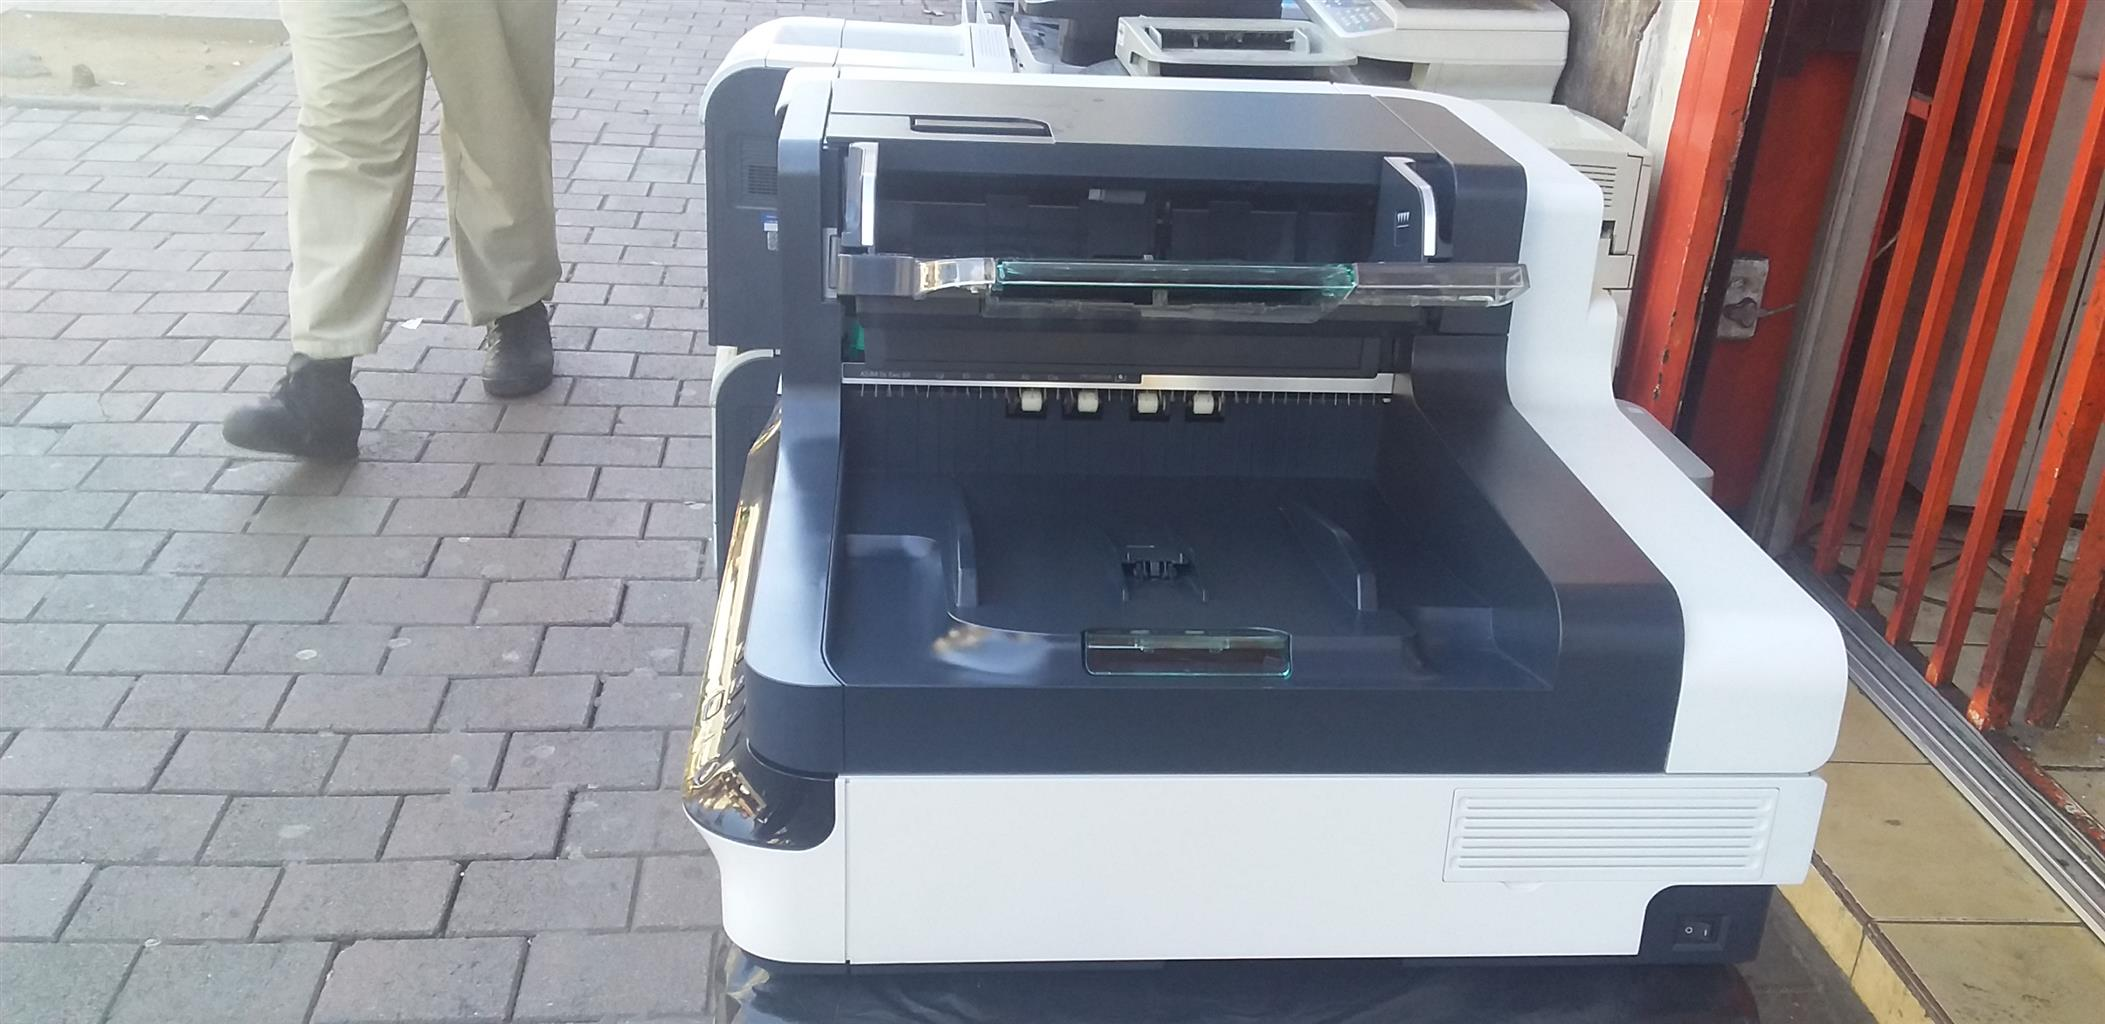 hp scanjet printer for sale